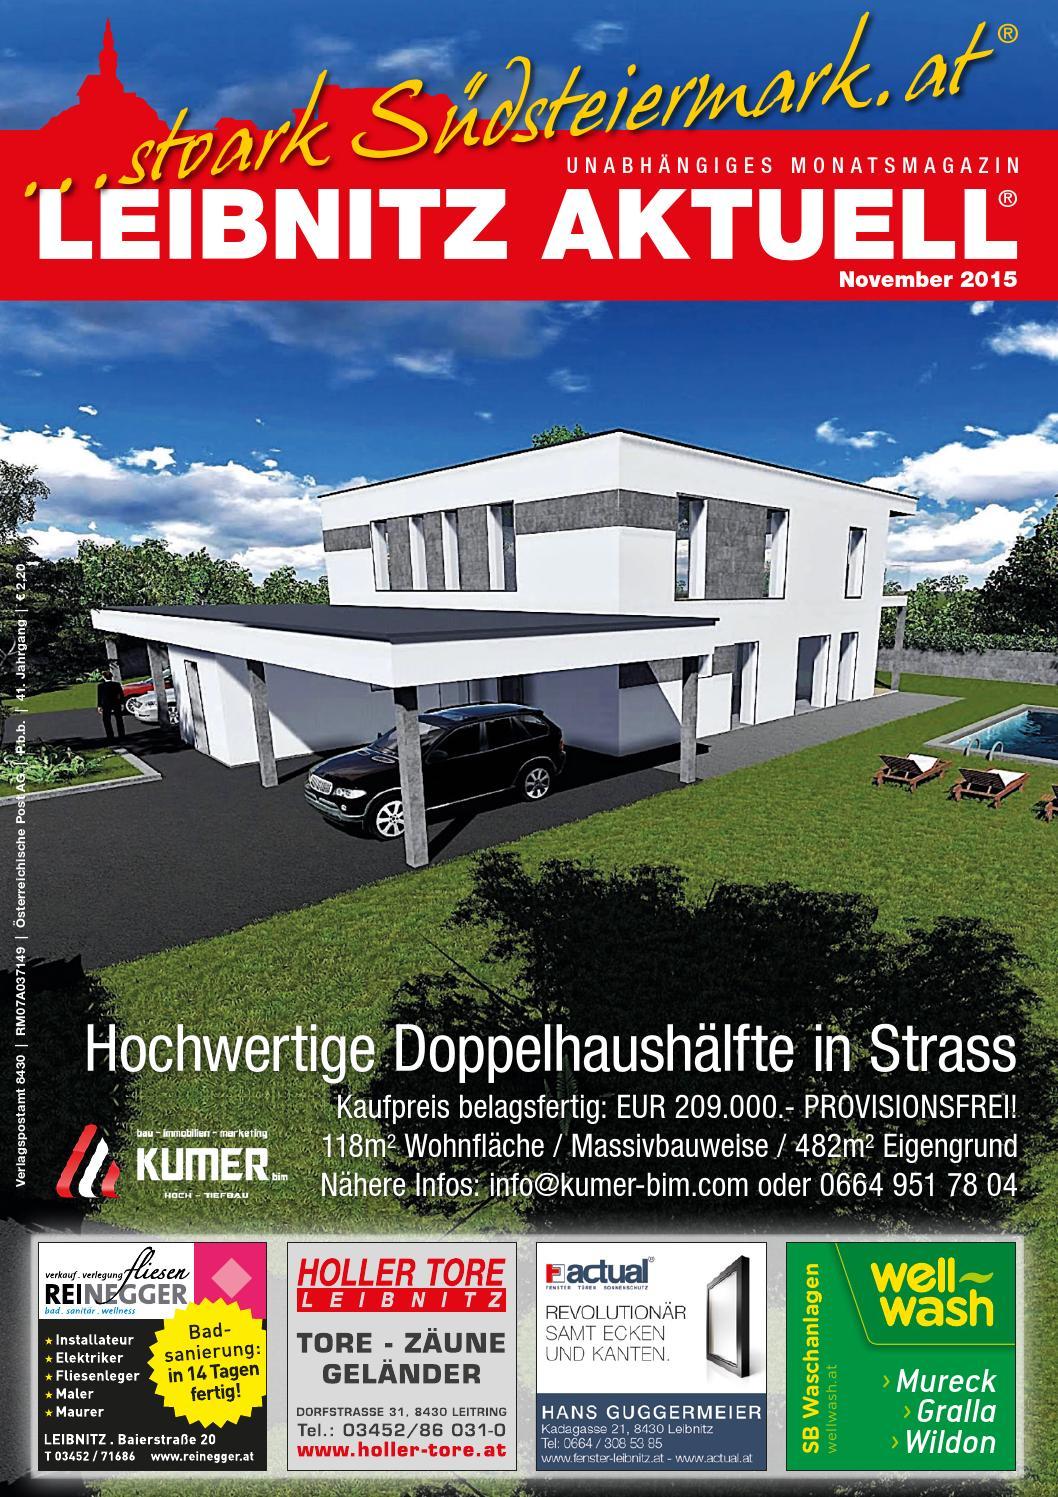 9bc5213b12042d November 2015 LEIBNITZ AKTUELL by Leibnitz Aktuell - issuu